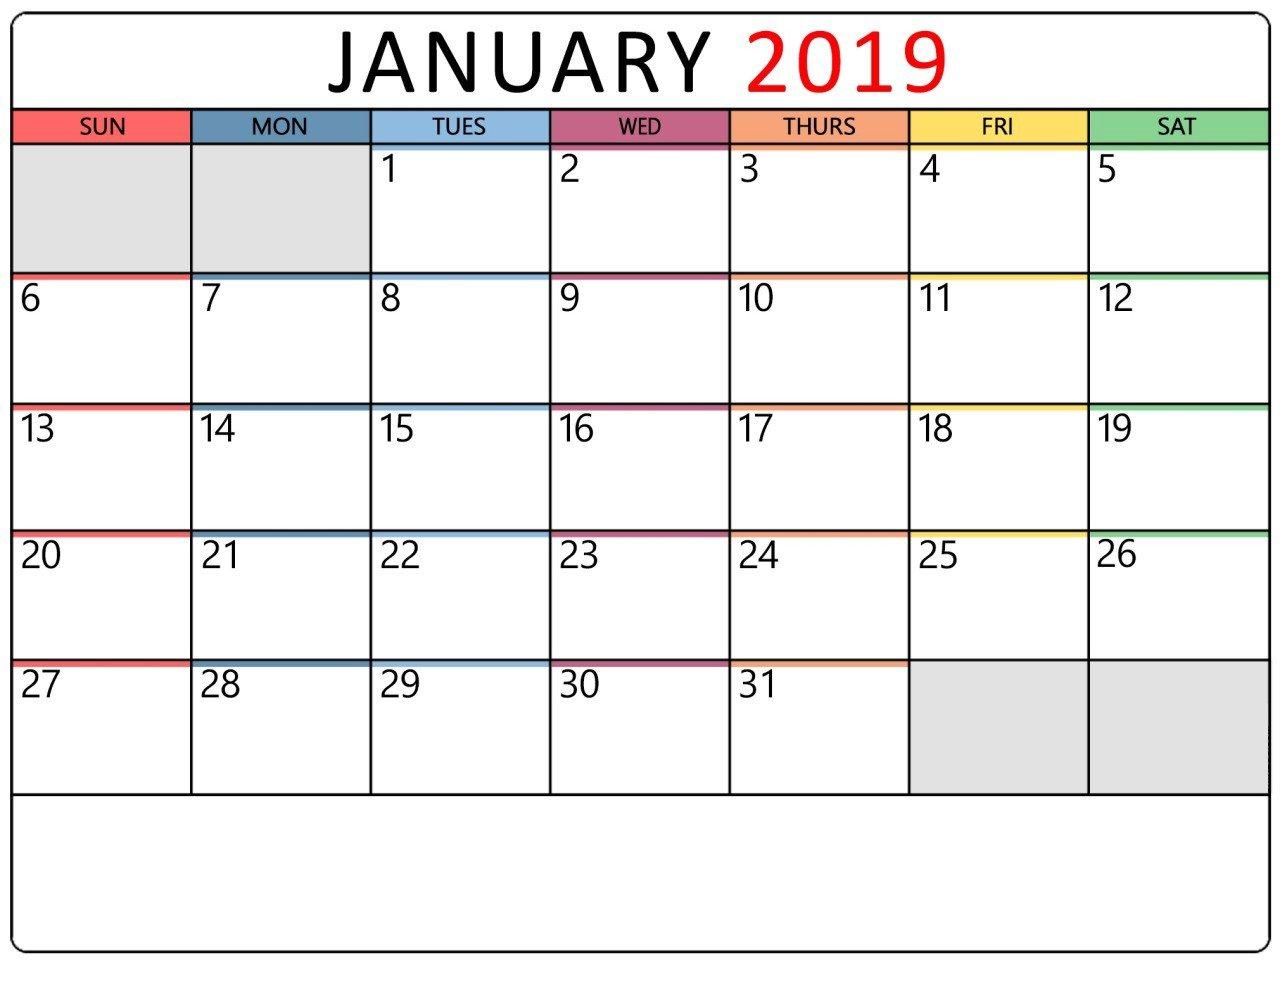 January 2019 Calendar Printable Templates – January Calendar – Medium Calendar 2019 Themes